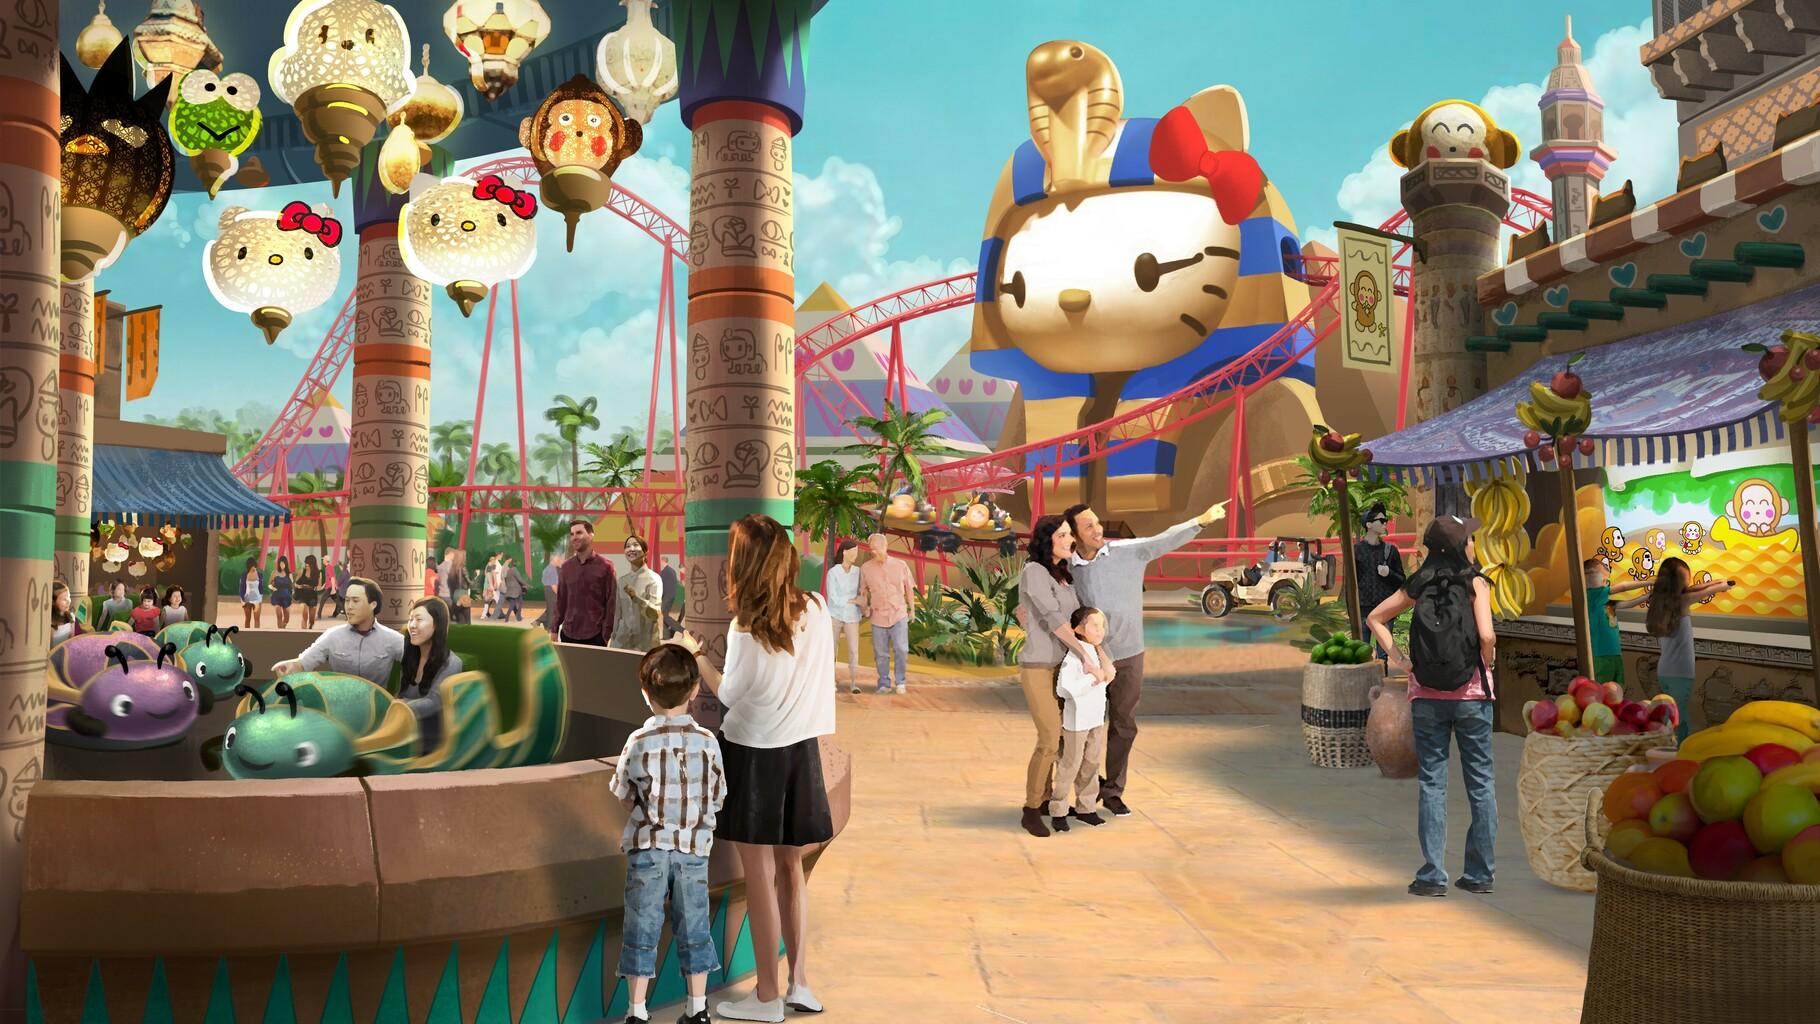 sanya-hello-kitty-theme-park-30775400.jpg